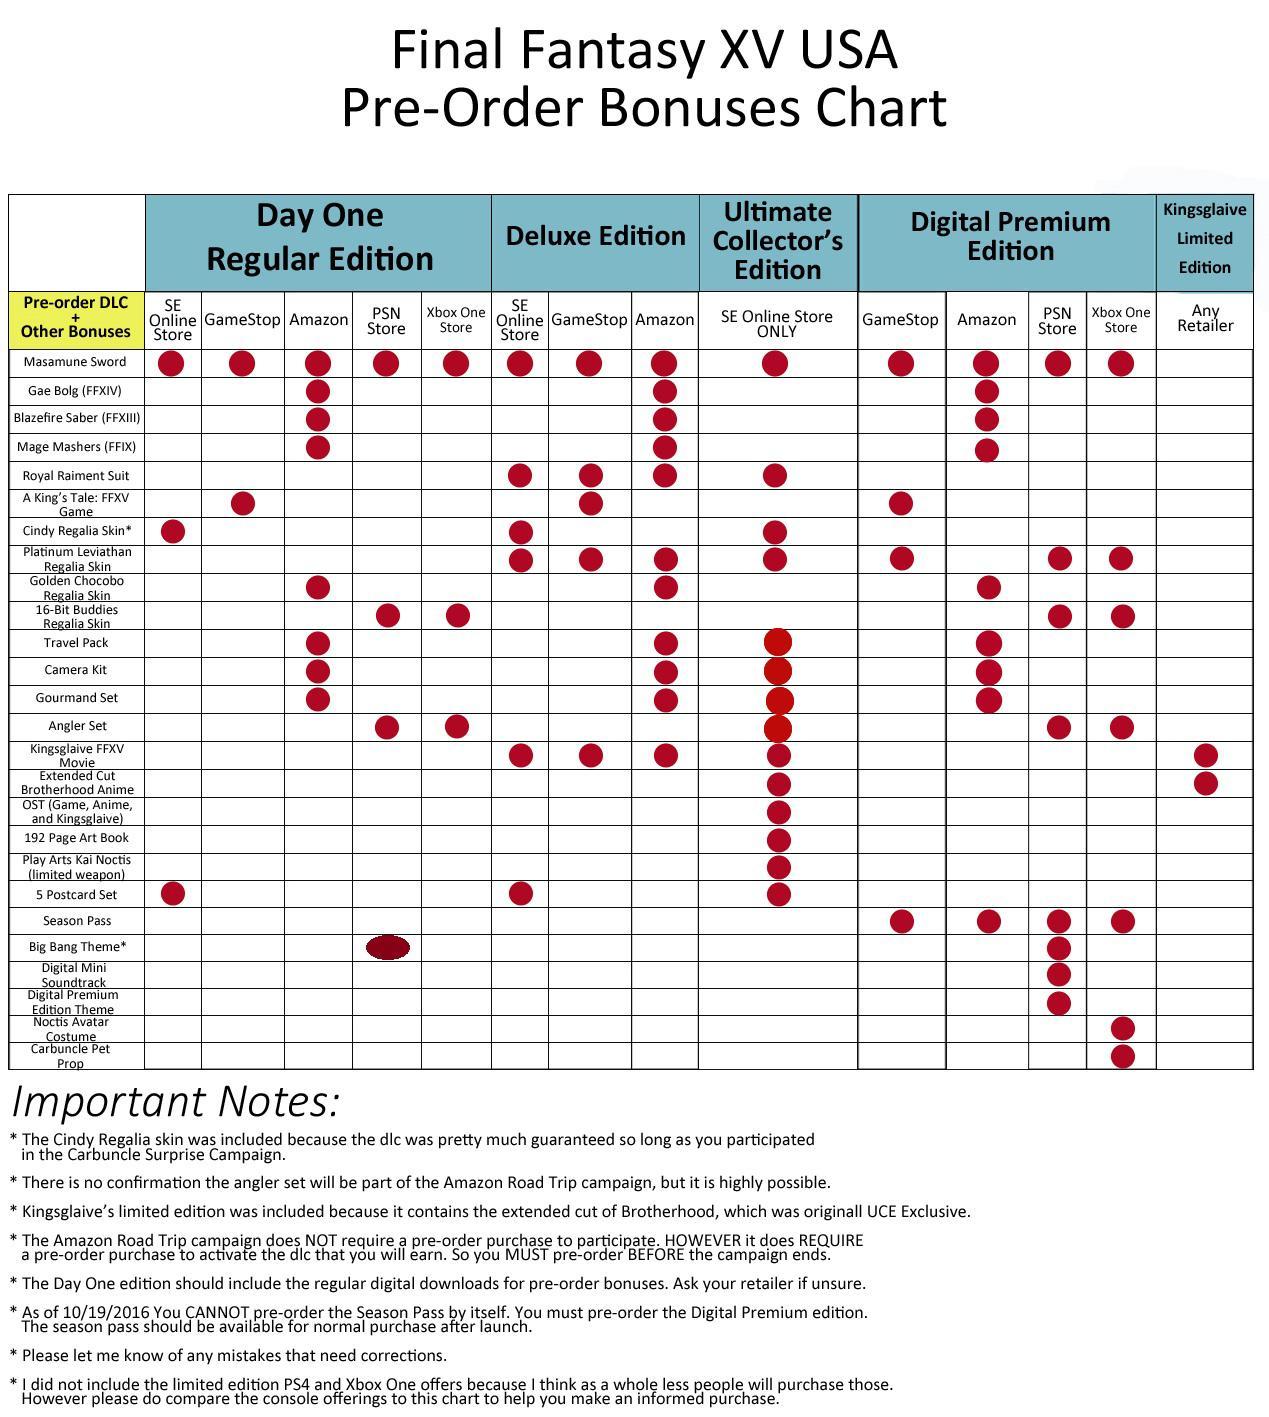 Final Fantasy XV - Preorder Chart